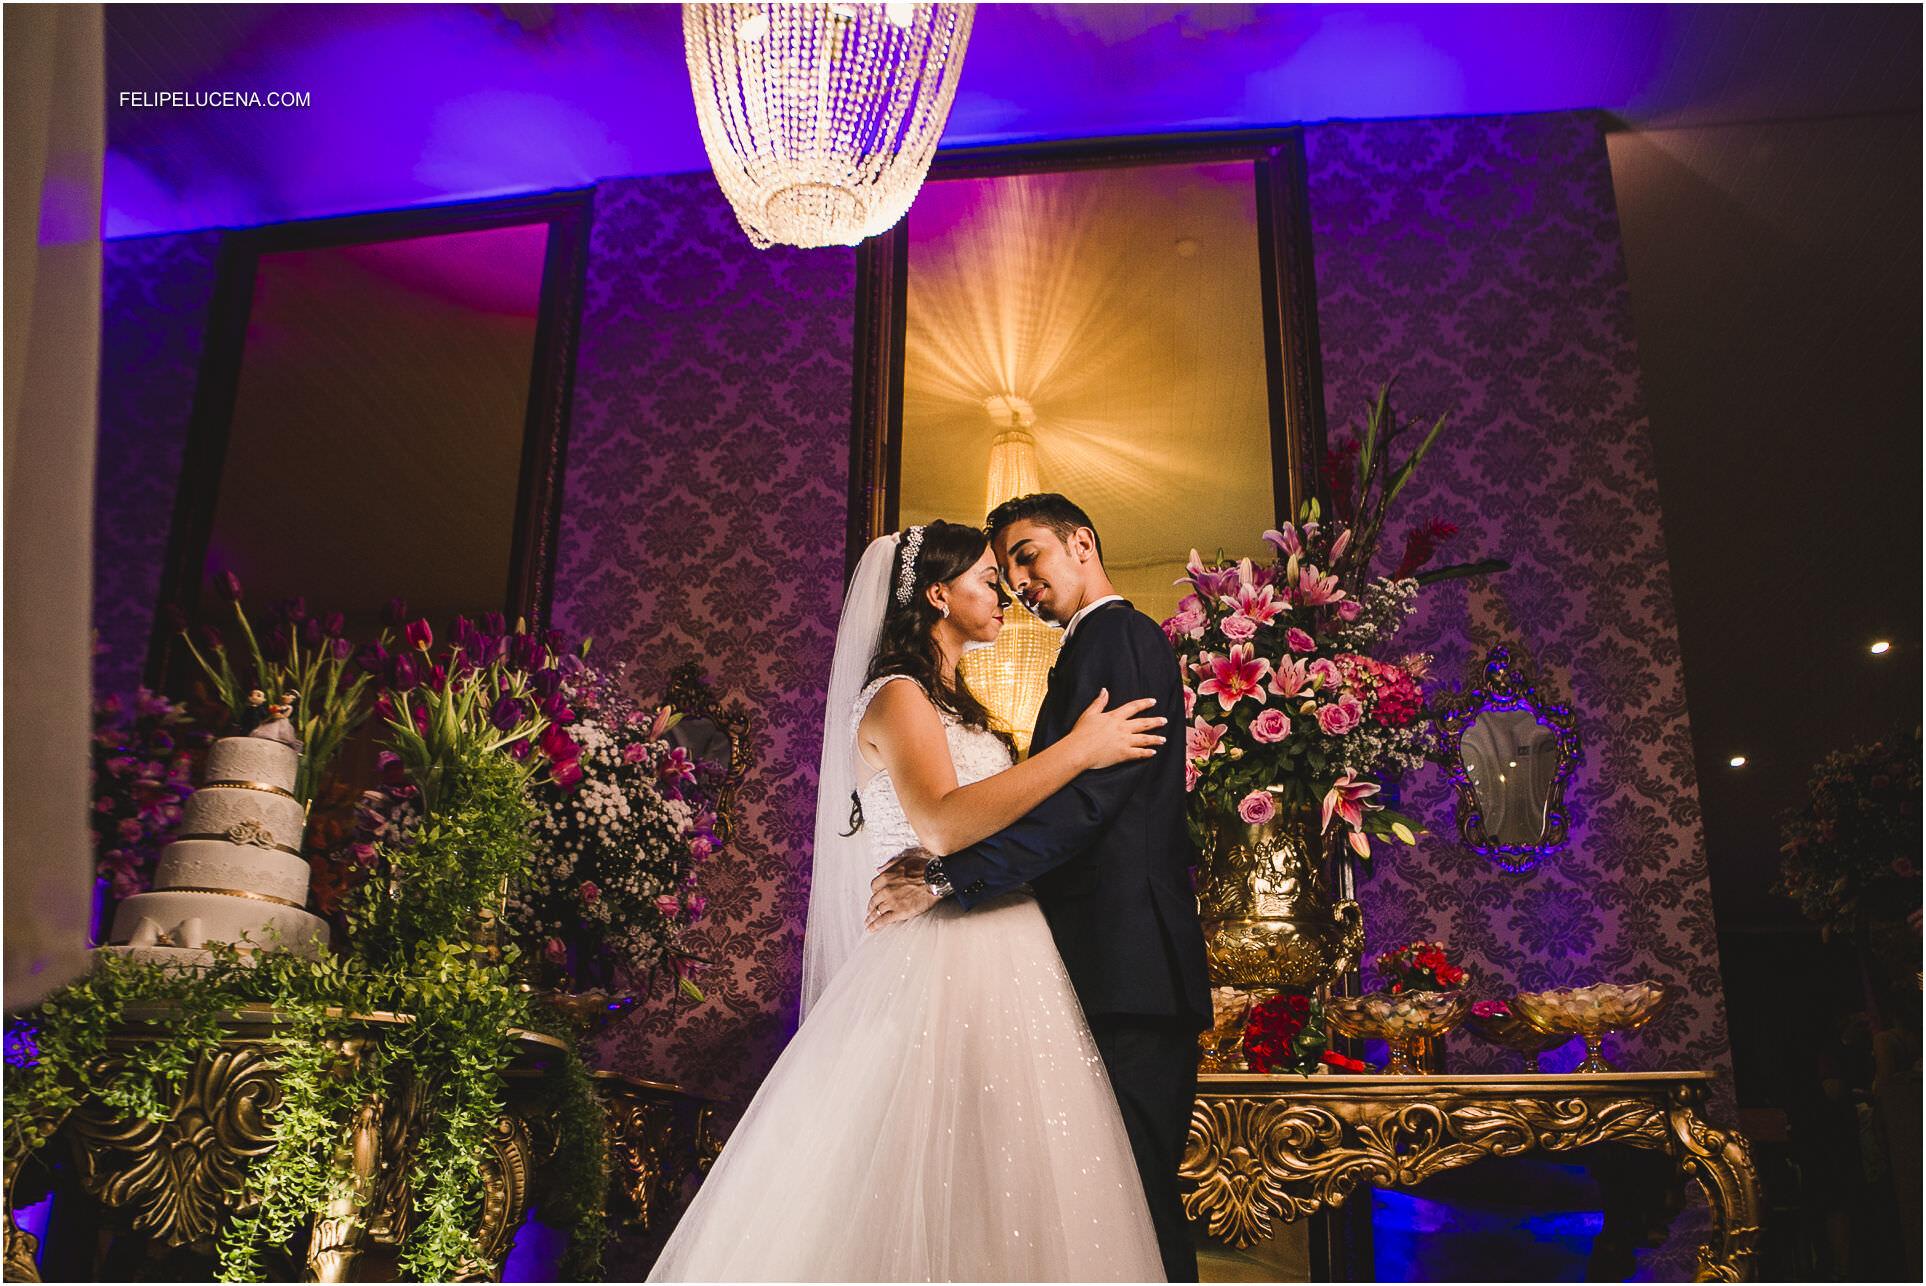 protocolares casamento